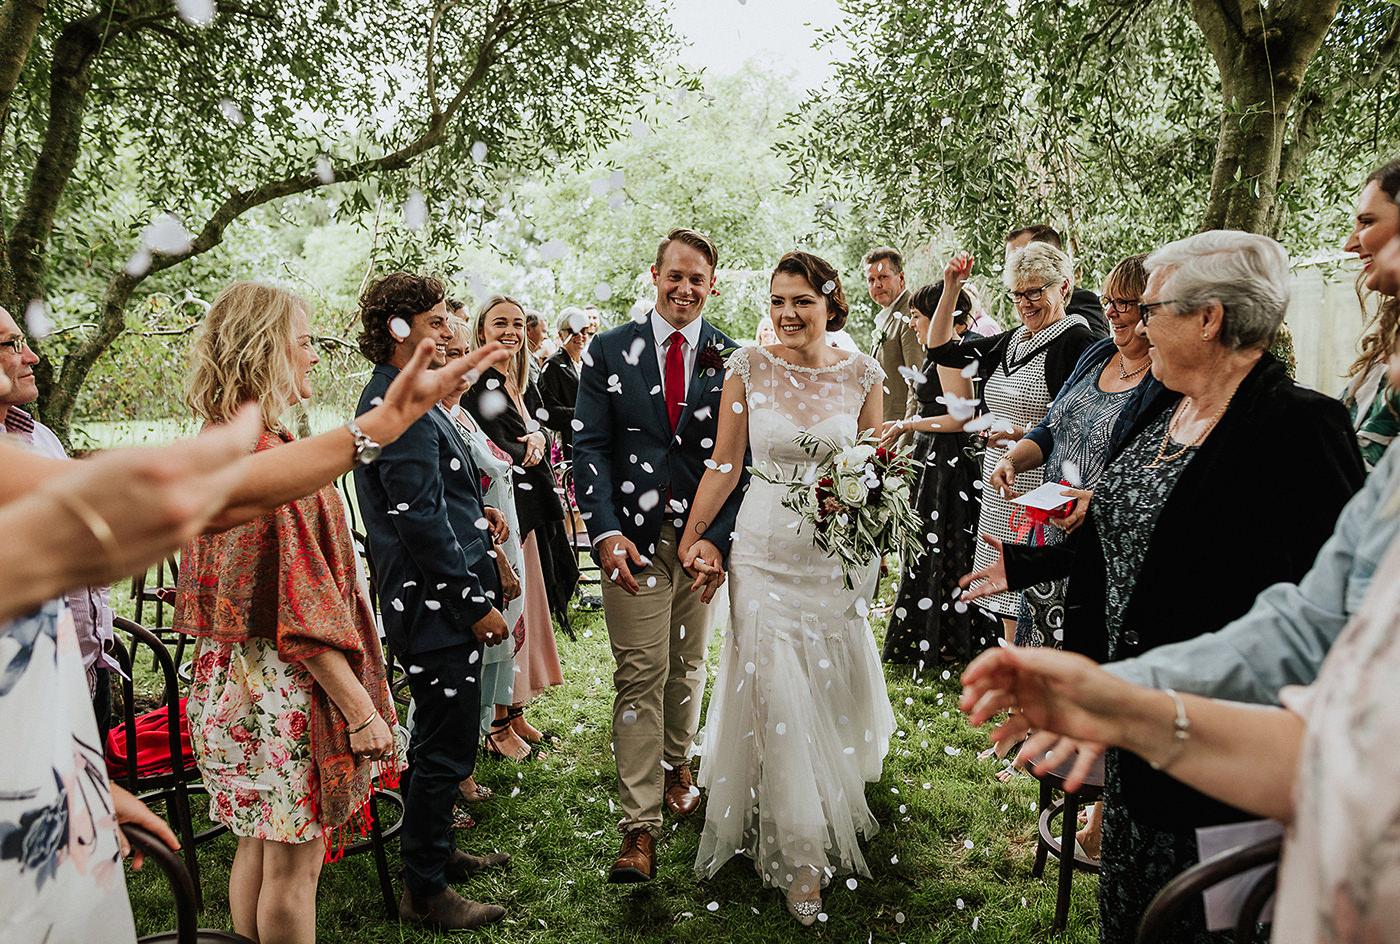 wedding_photographer_nz-00079.jpg